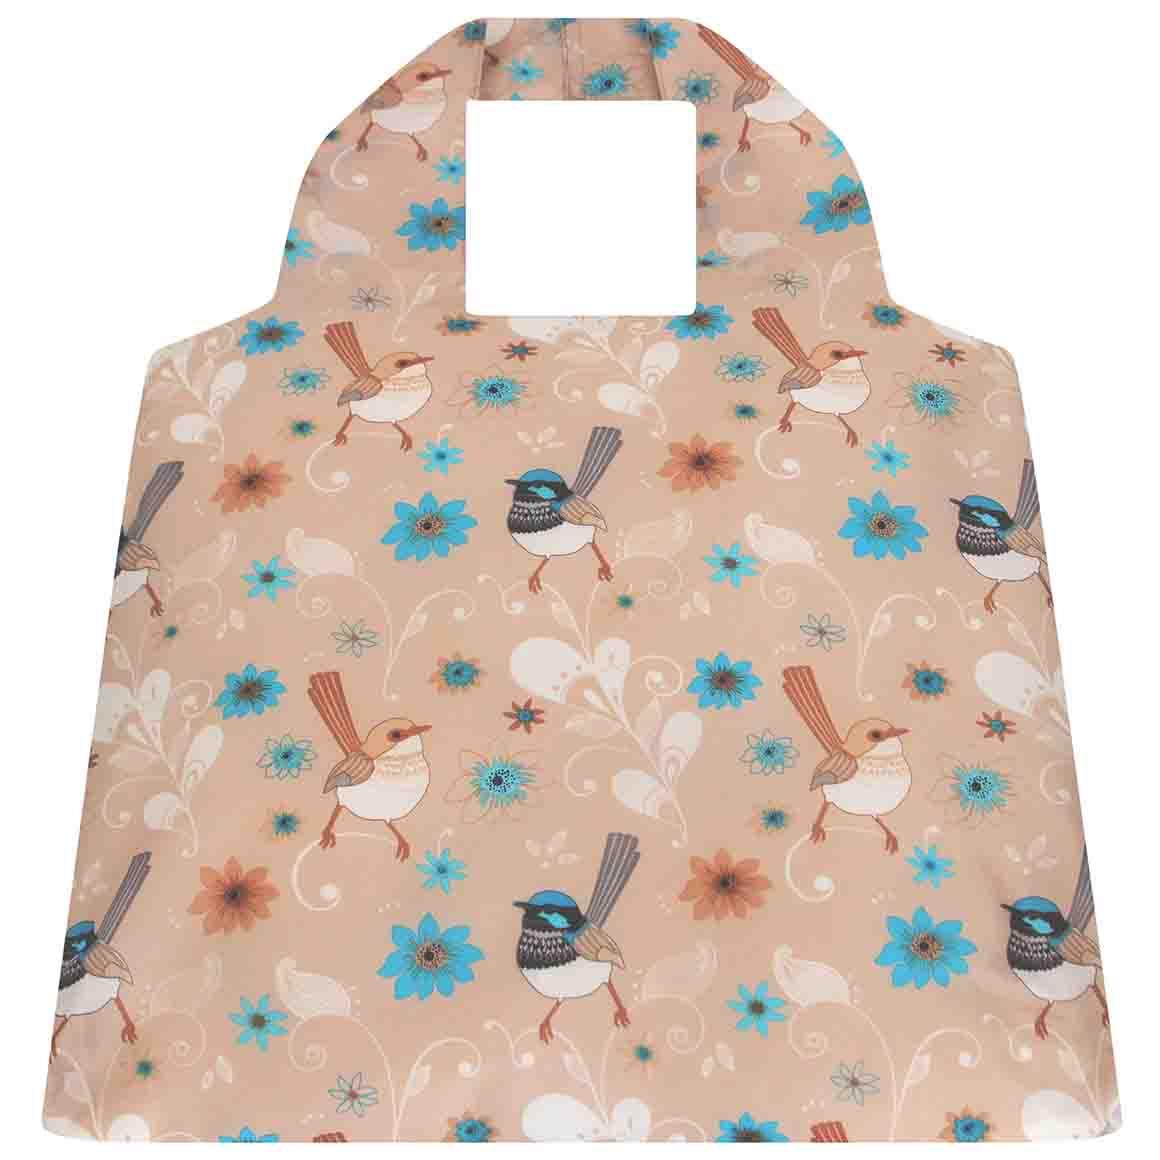 Wren SAKitToMe Foldable Shopping Bag  | Trada Marketplace